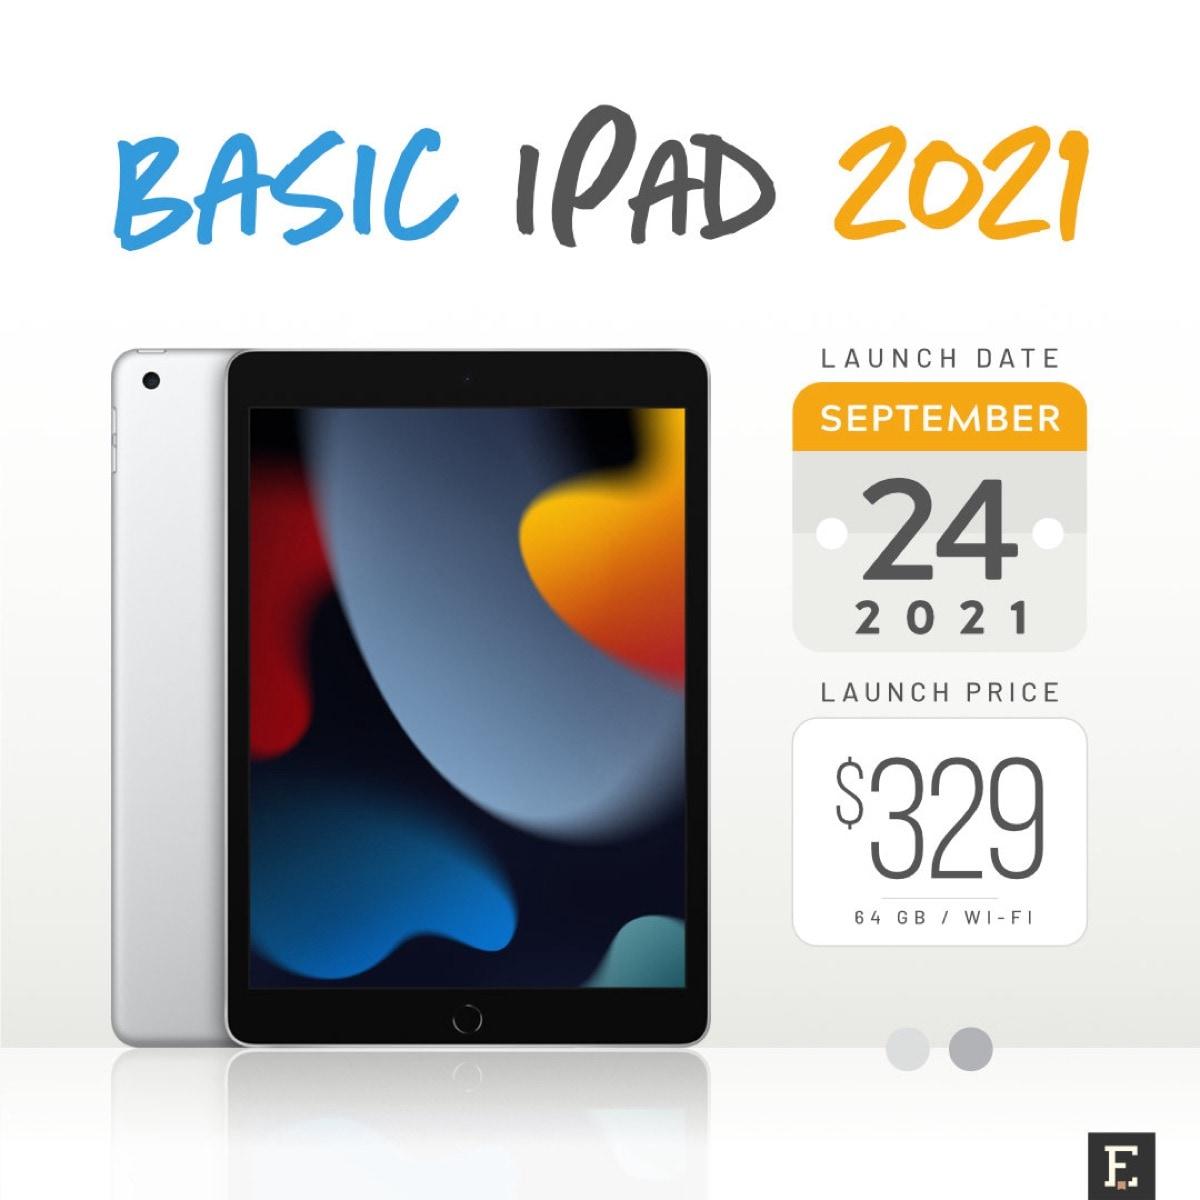 Basic iPad 2021 10.2-inch full specs